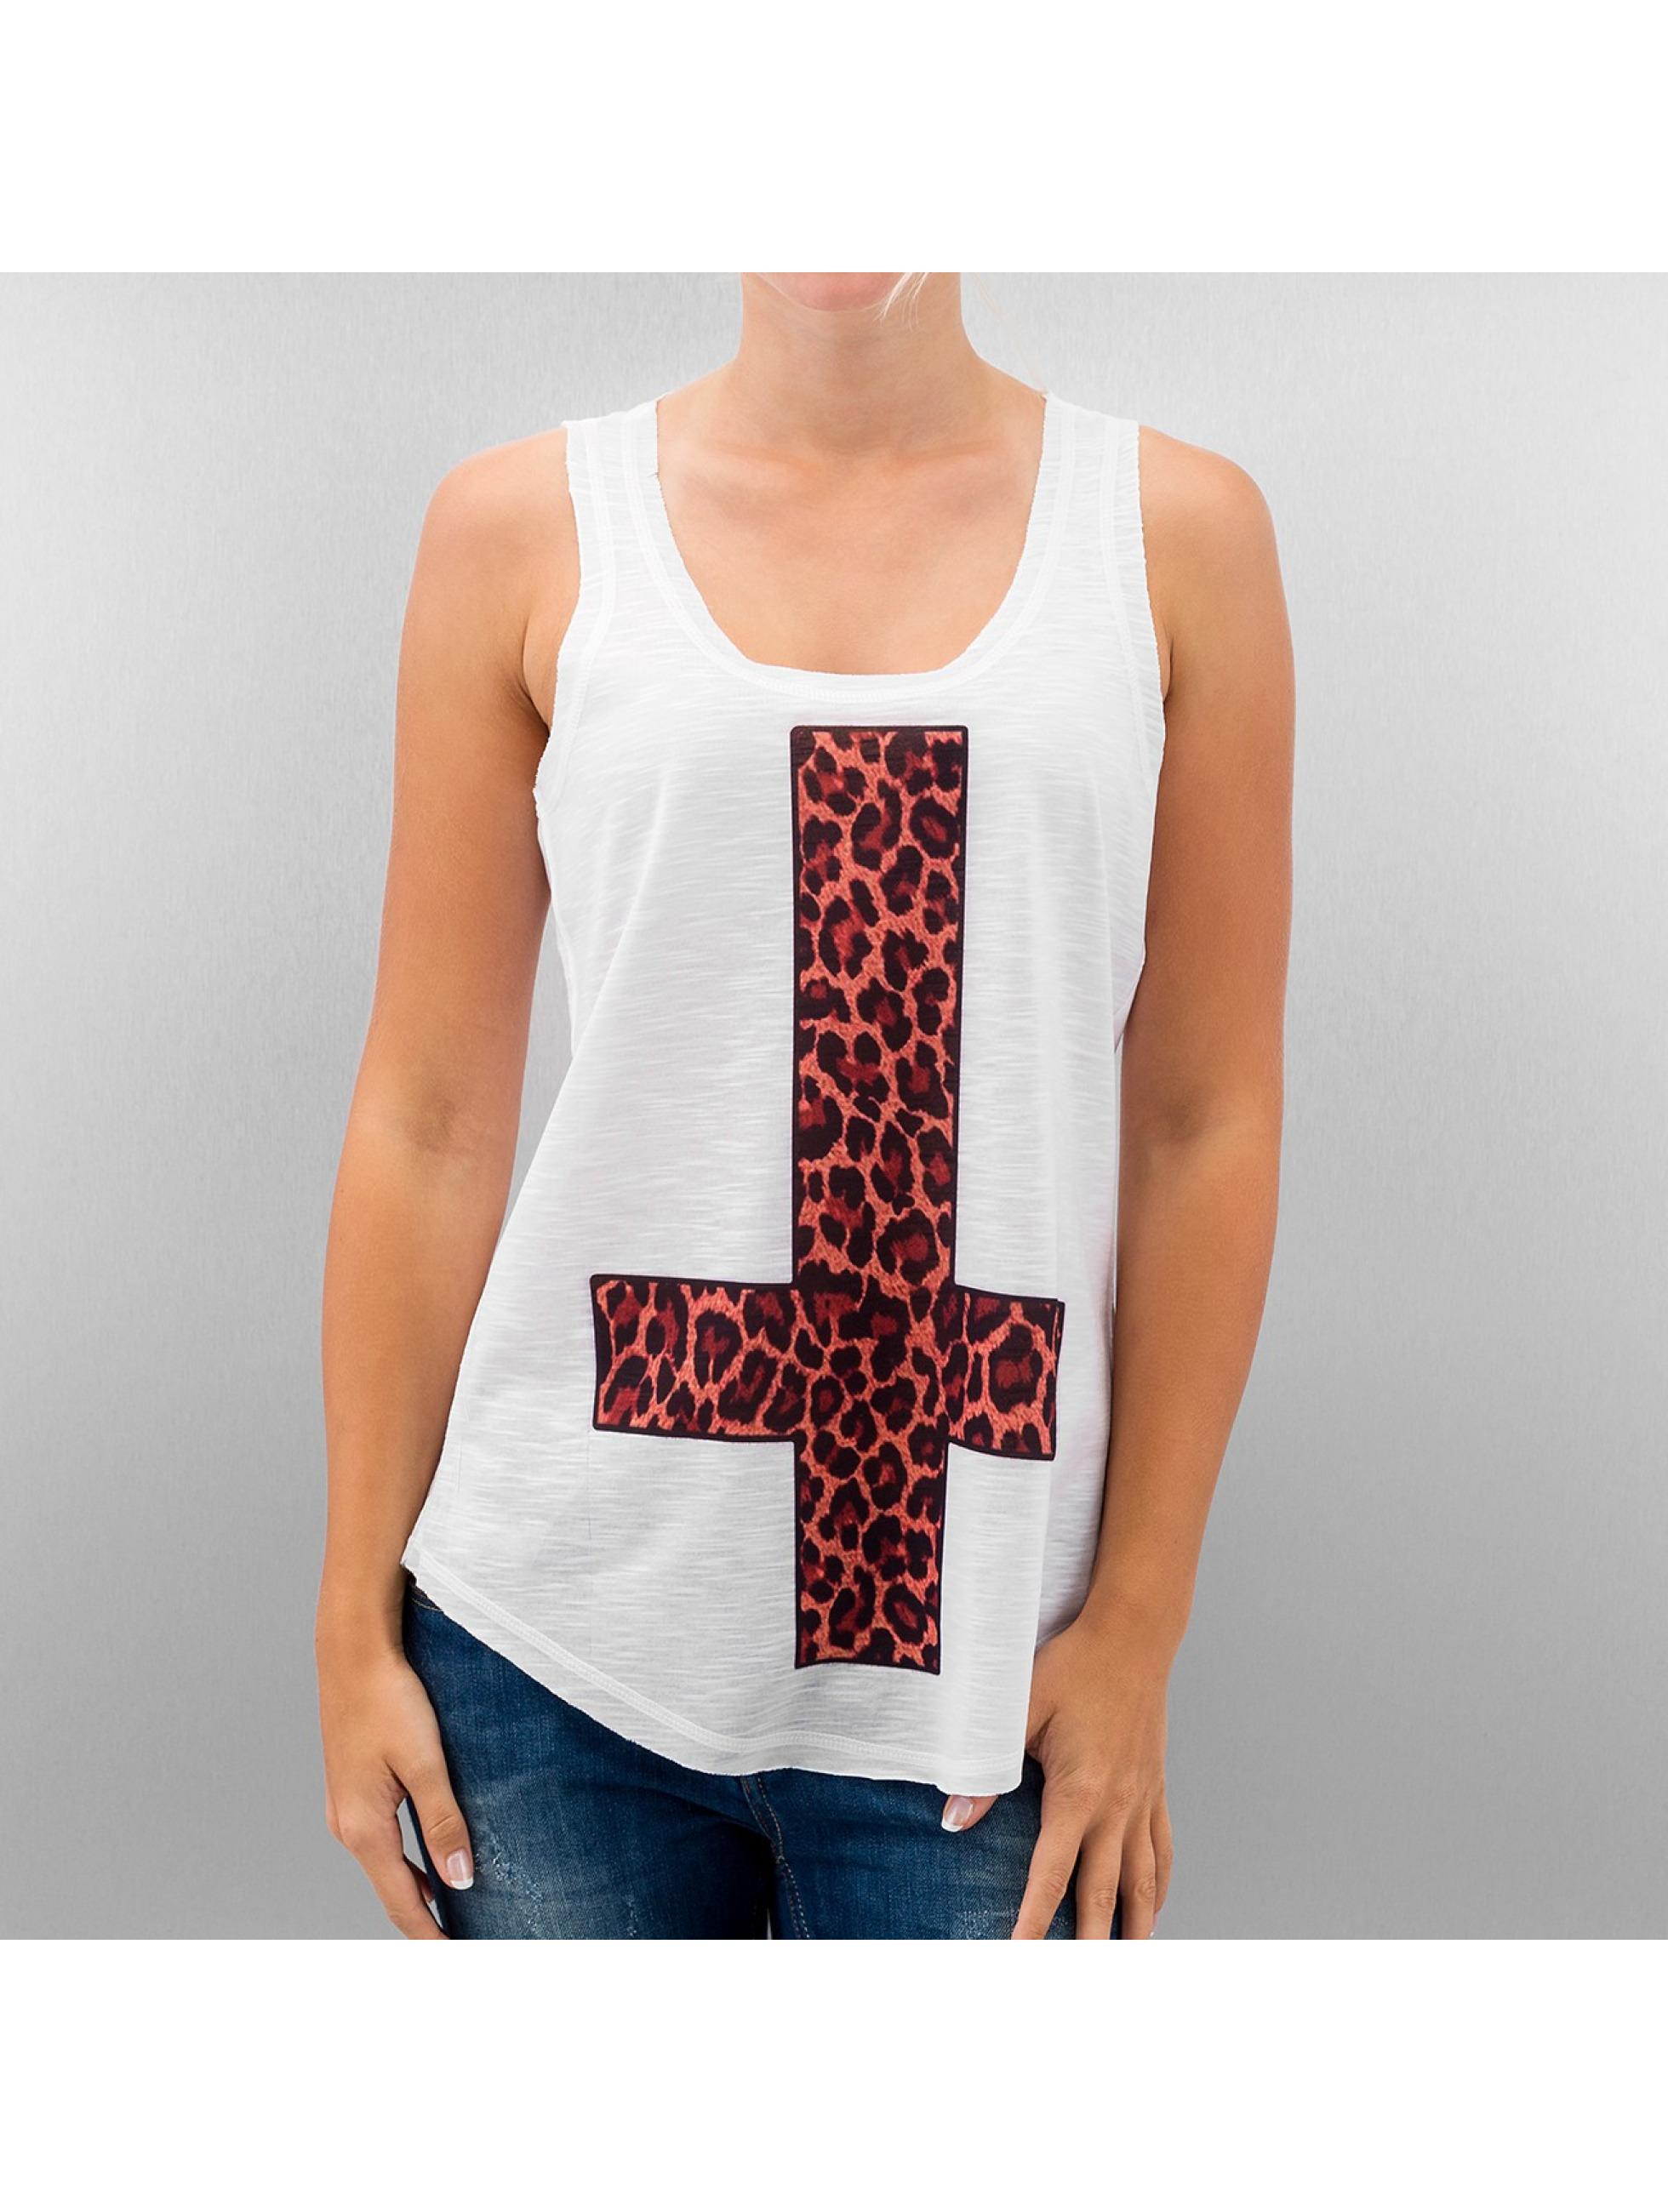 monkey business damen oberteile tank tops leopard cross ebay. Black Bedroom Furniture Sets. Home Design Ideas